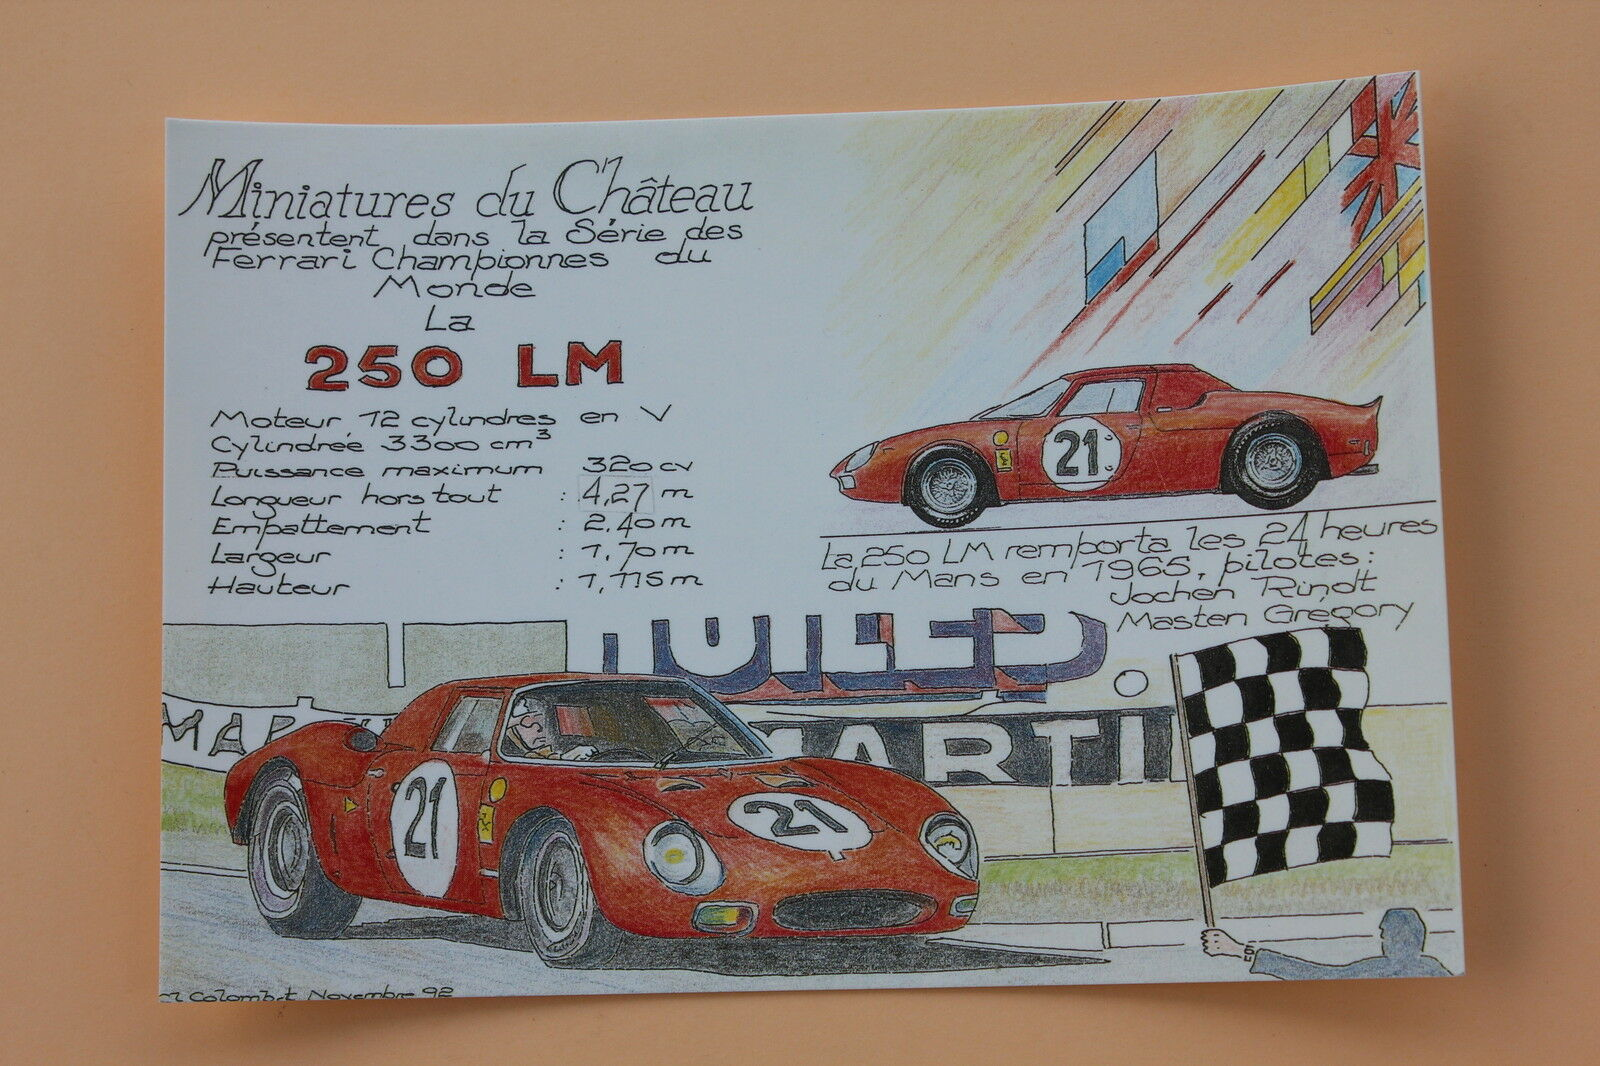 PE Miniatures château Carte postal postal postal Ferrari 250 LM 24 heures Mans 1956 N°21 Heco a7704c